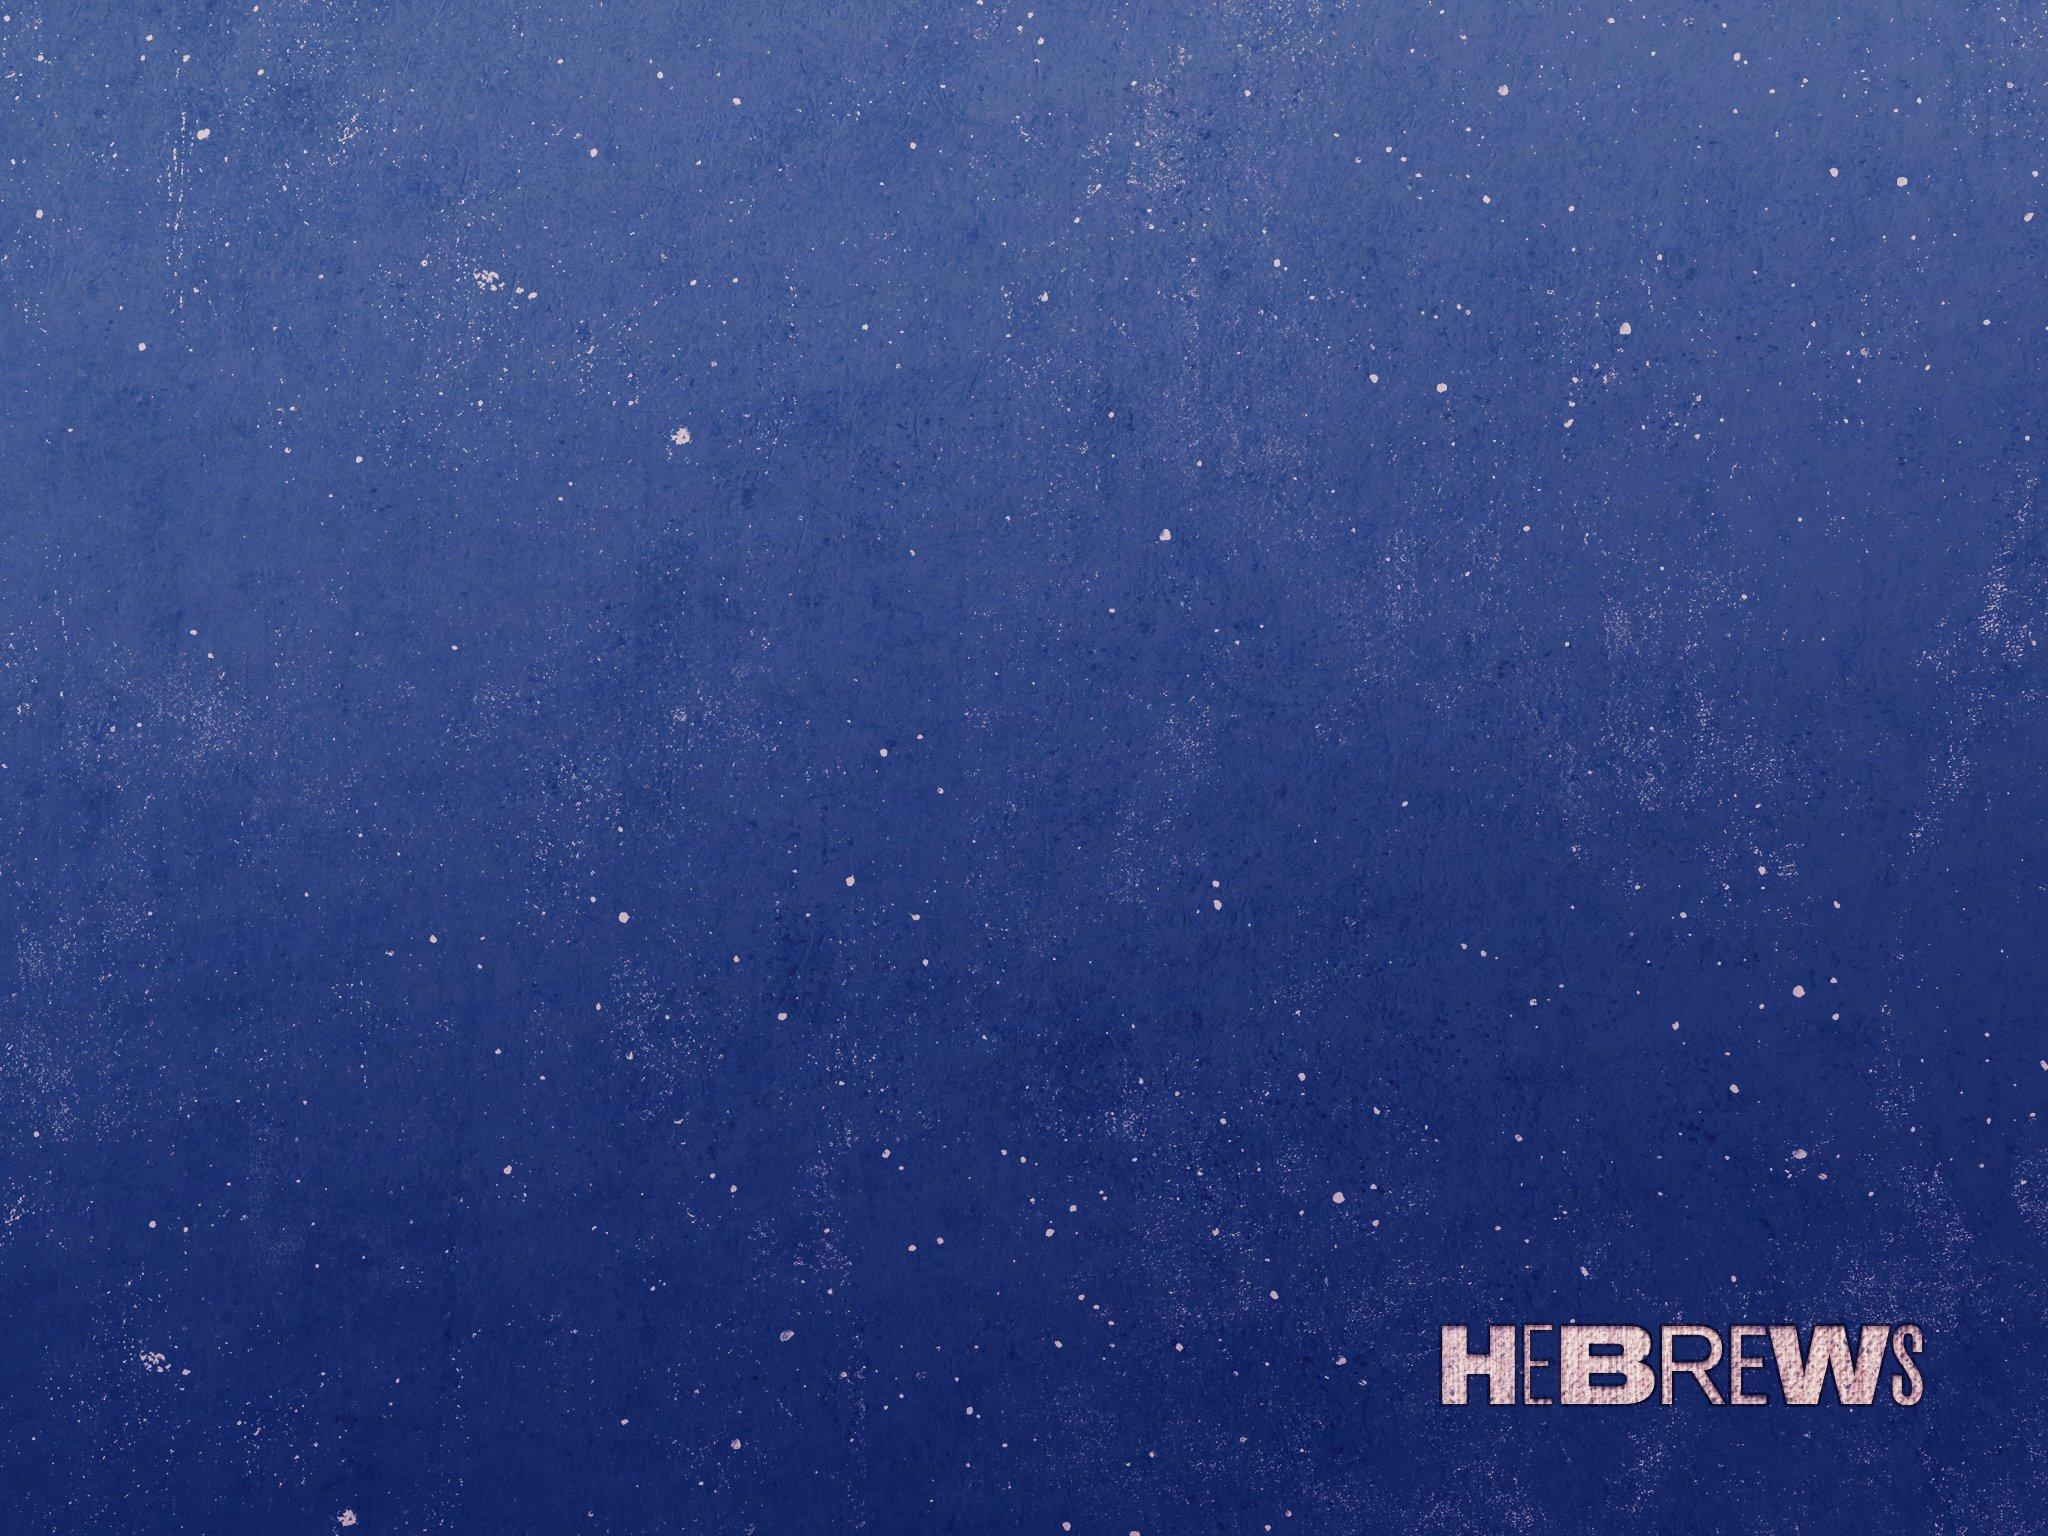 58-Hebrews_Secondary_4x3-fullscreen.jpg